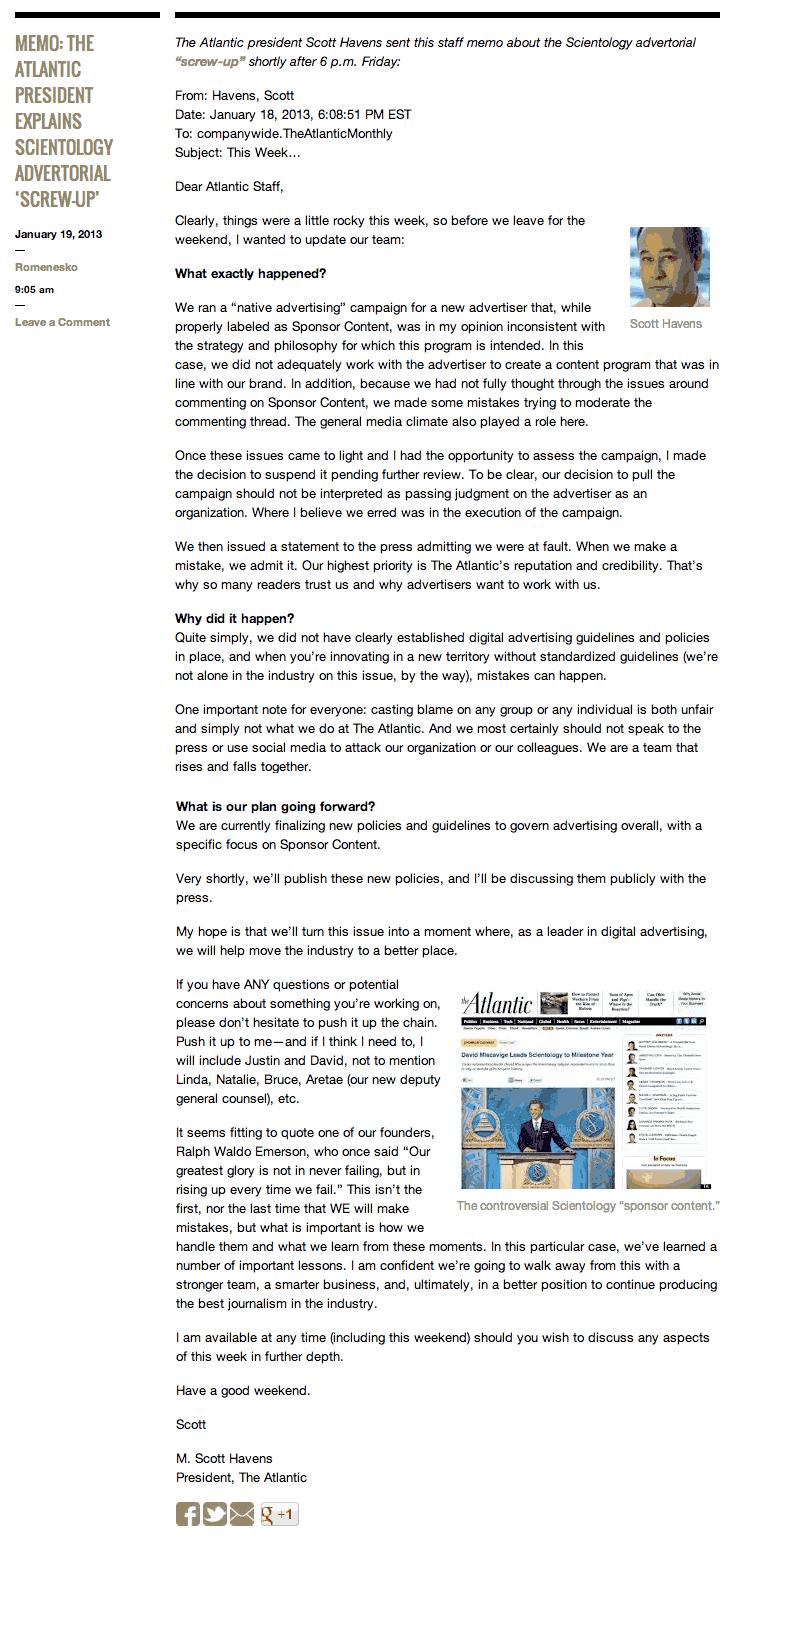 Atlantic president Scott Havens memo on Scientology